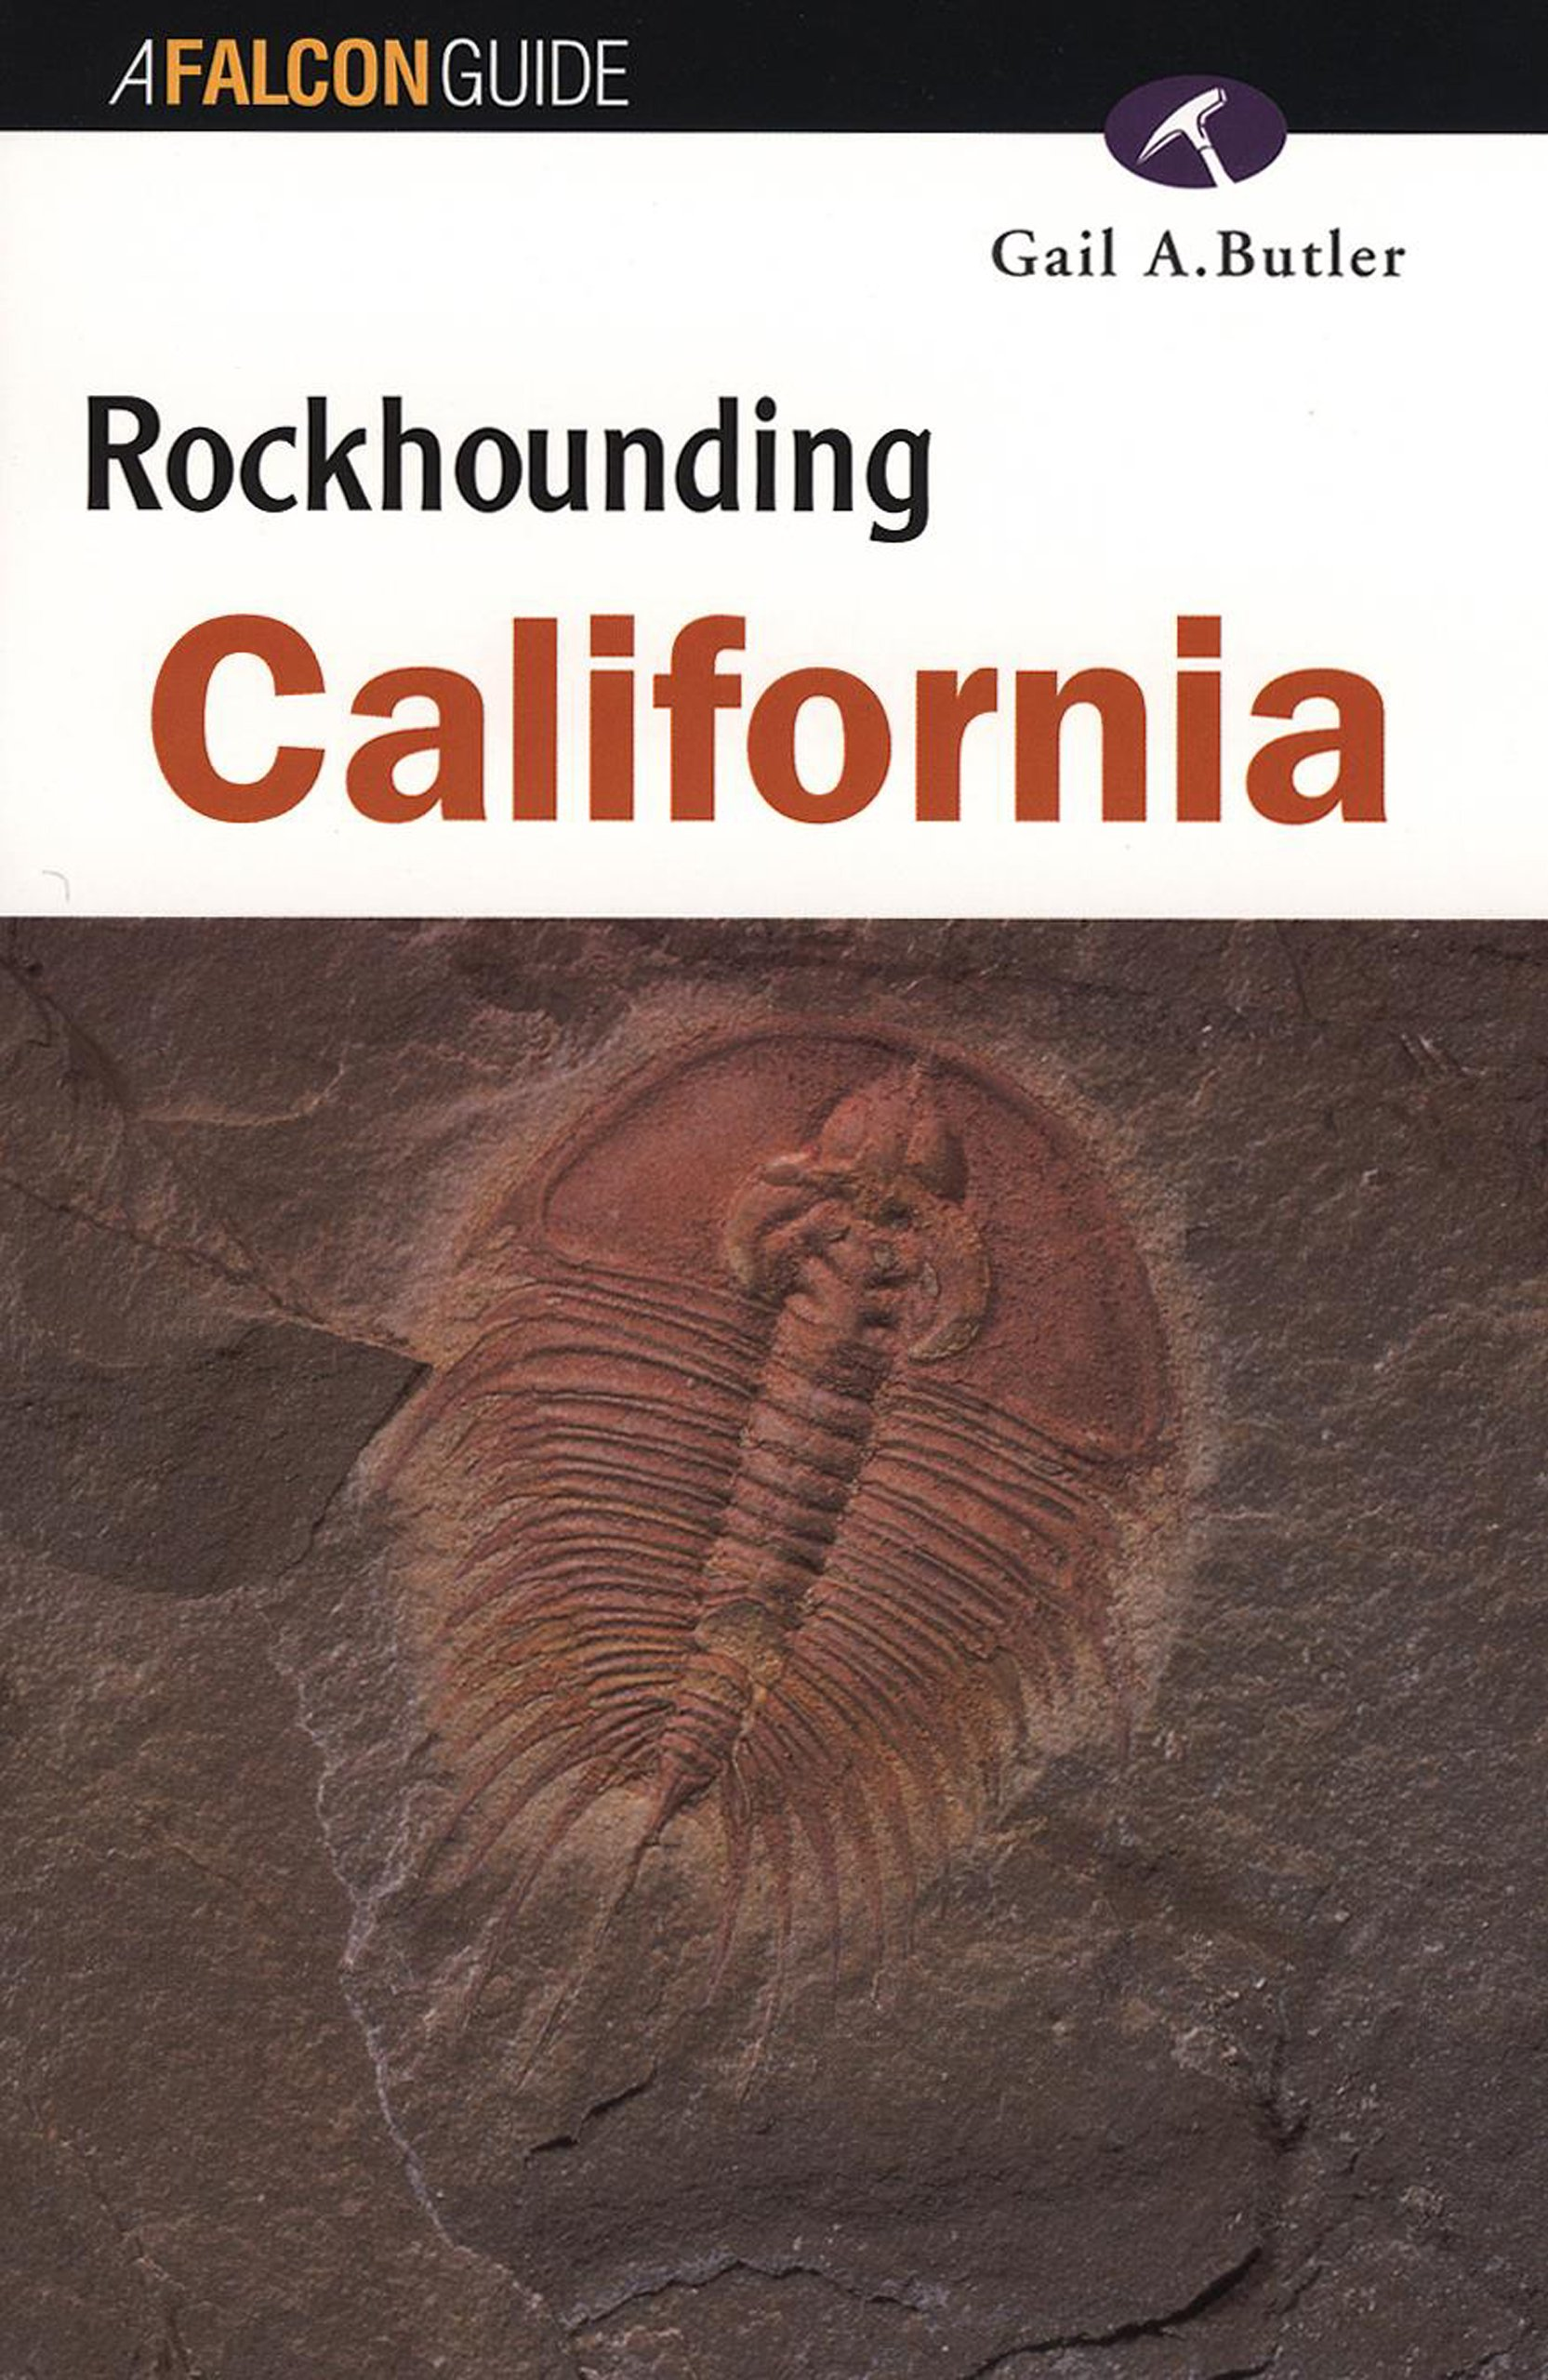 Rockhounding California Map.Rockhounding California Rockhounding Series Gail A Butler